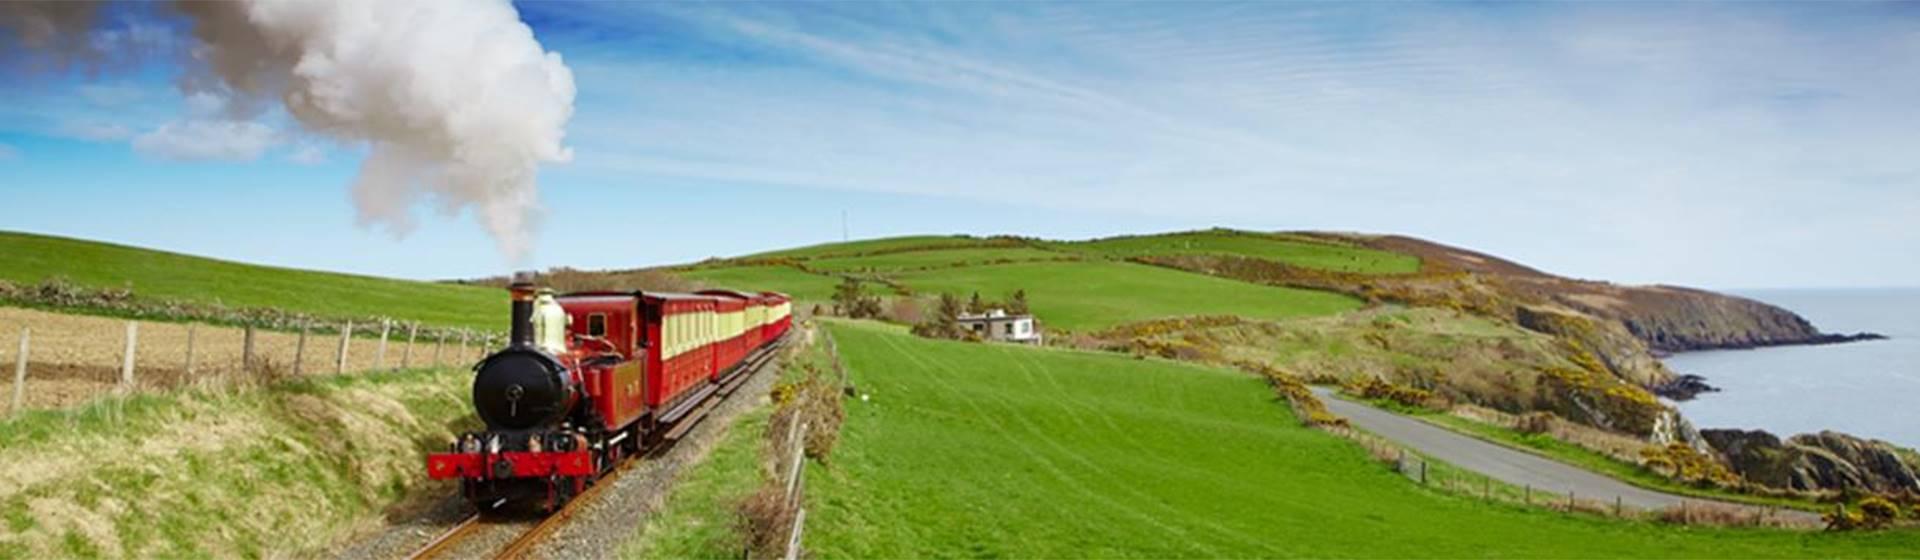 Isle of Man Steam Railway & Cregneash Folk Museum